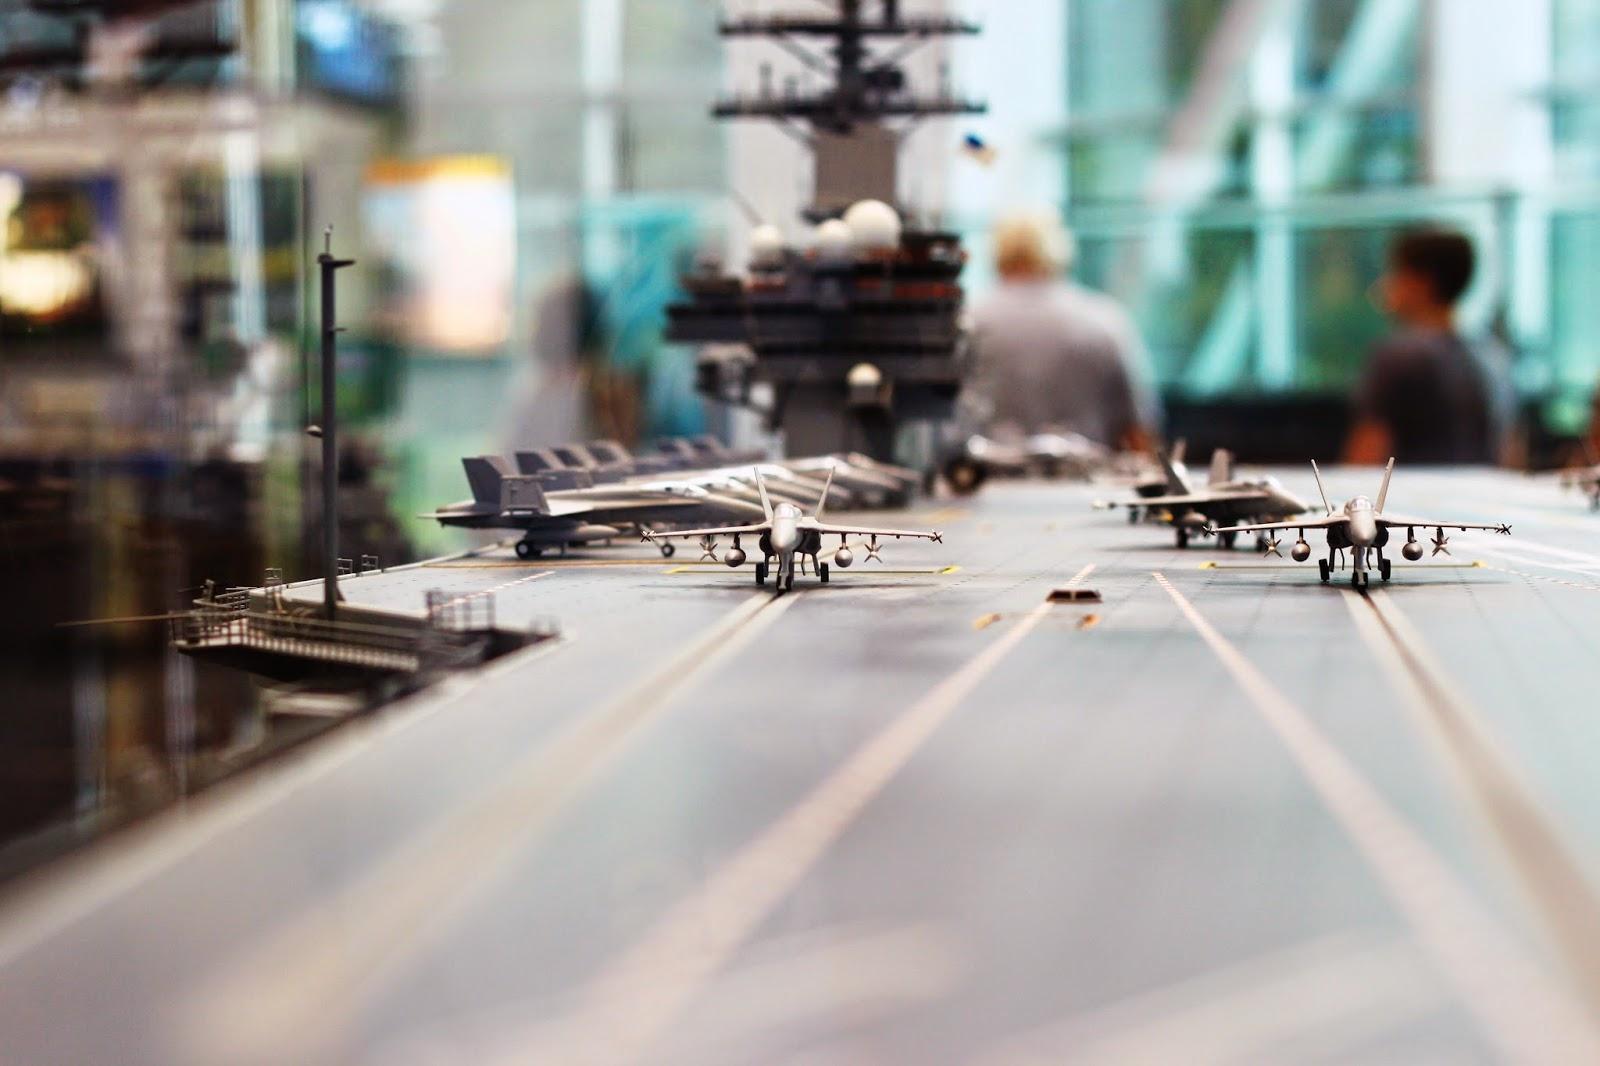 Pensacola NAS museum air craft carrier miniature